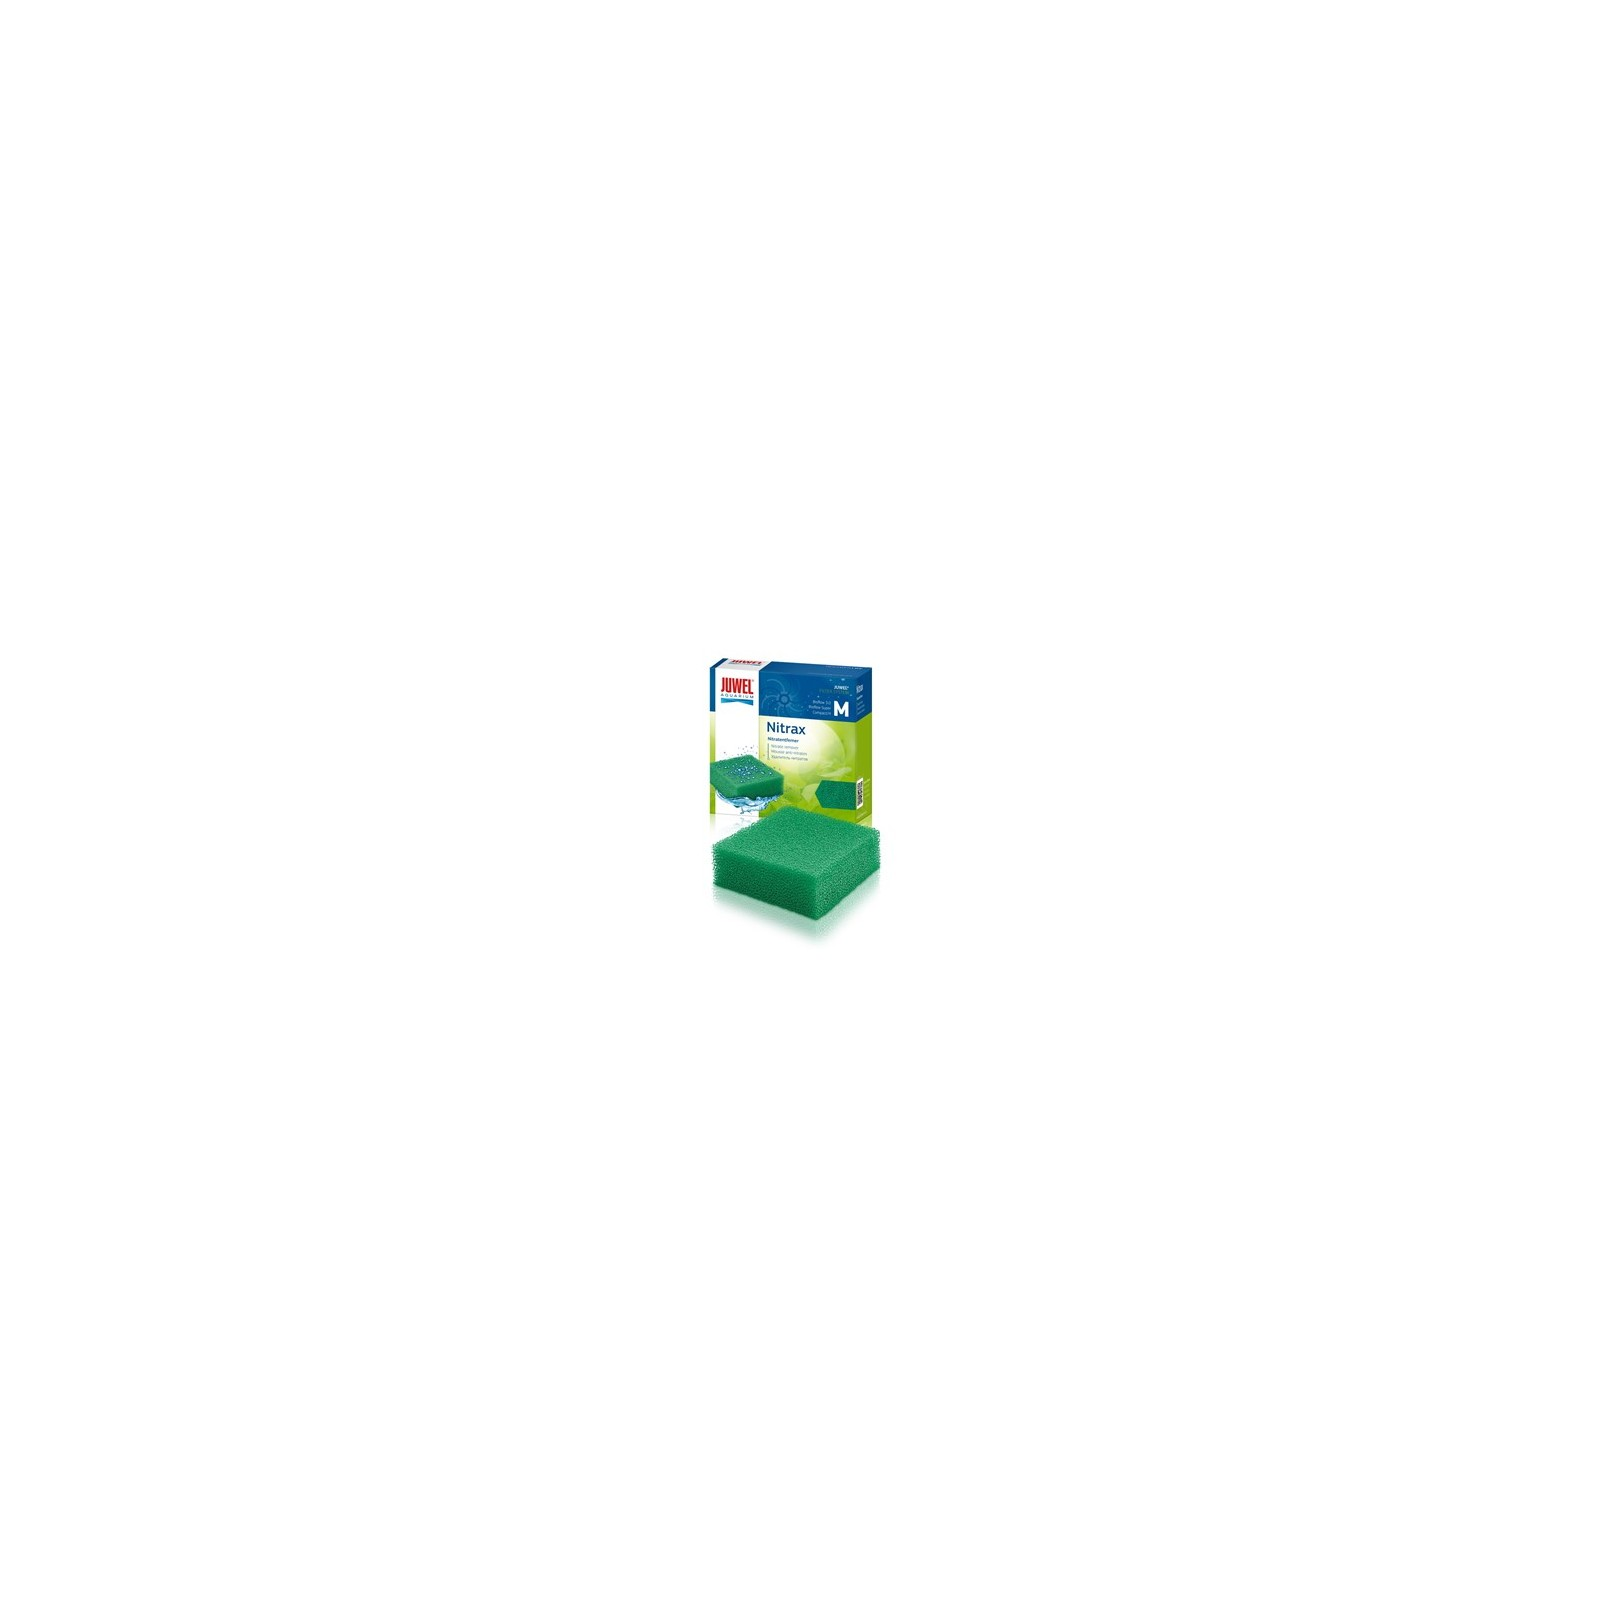 Filtrační náplň Juwel - Nitrax Entferner COMPACT / Bioflow 3.0 / M